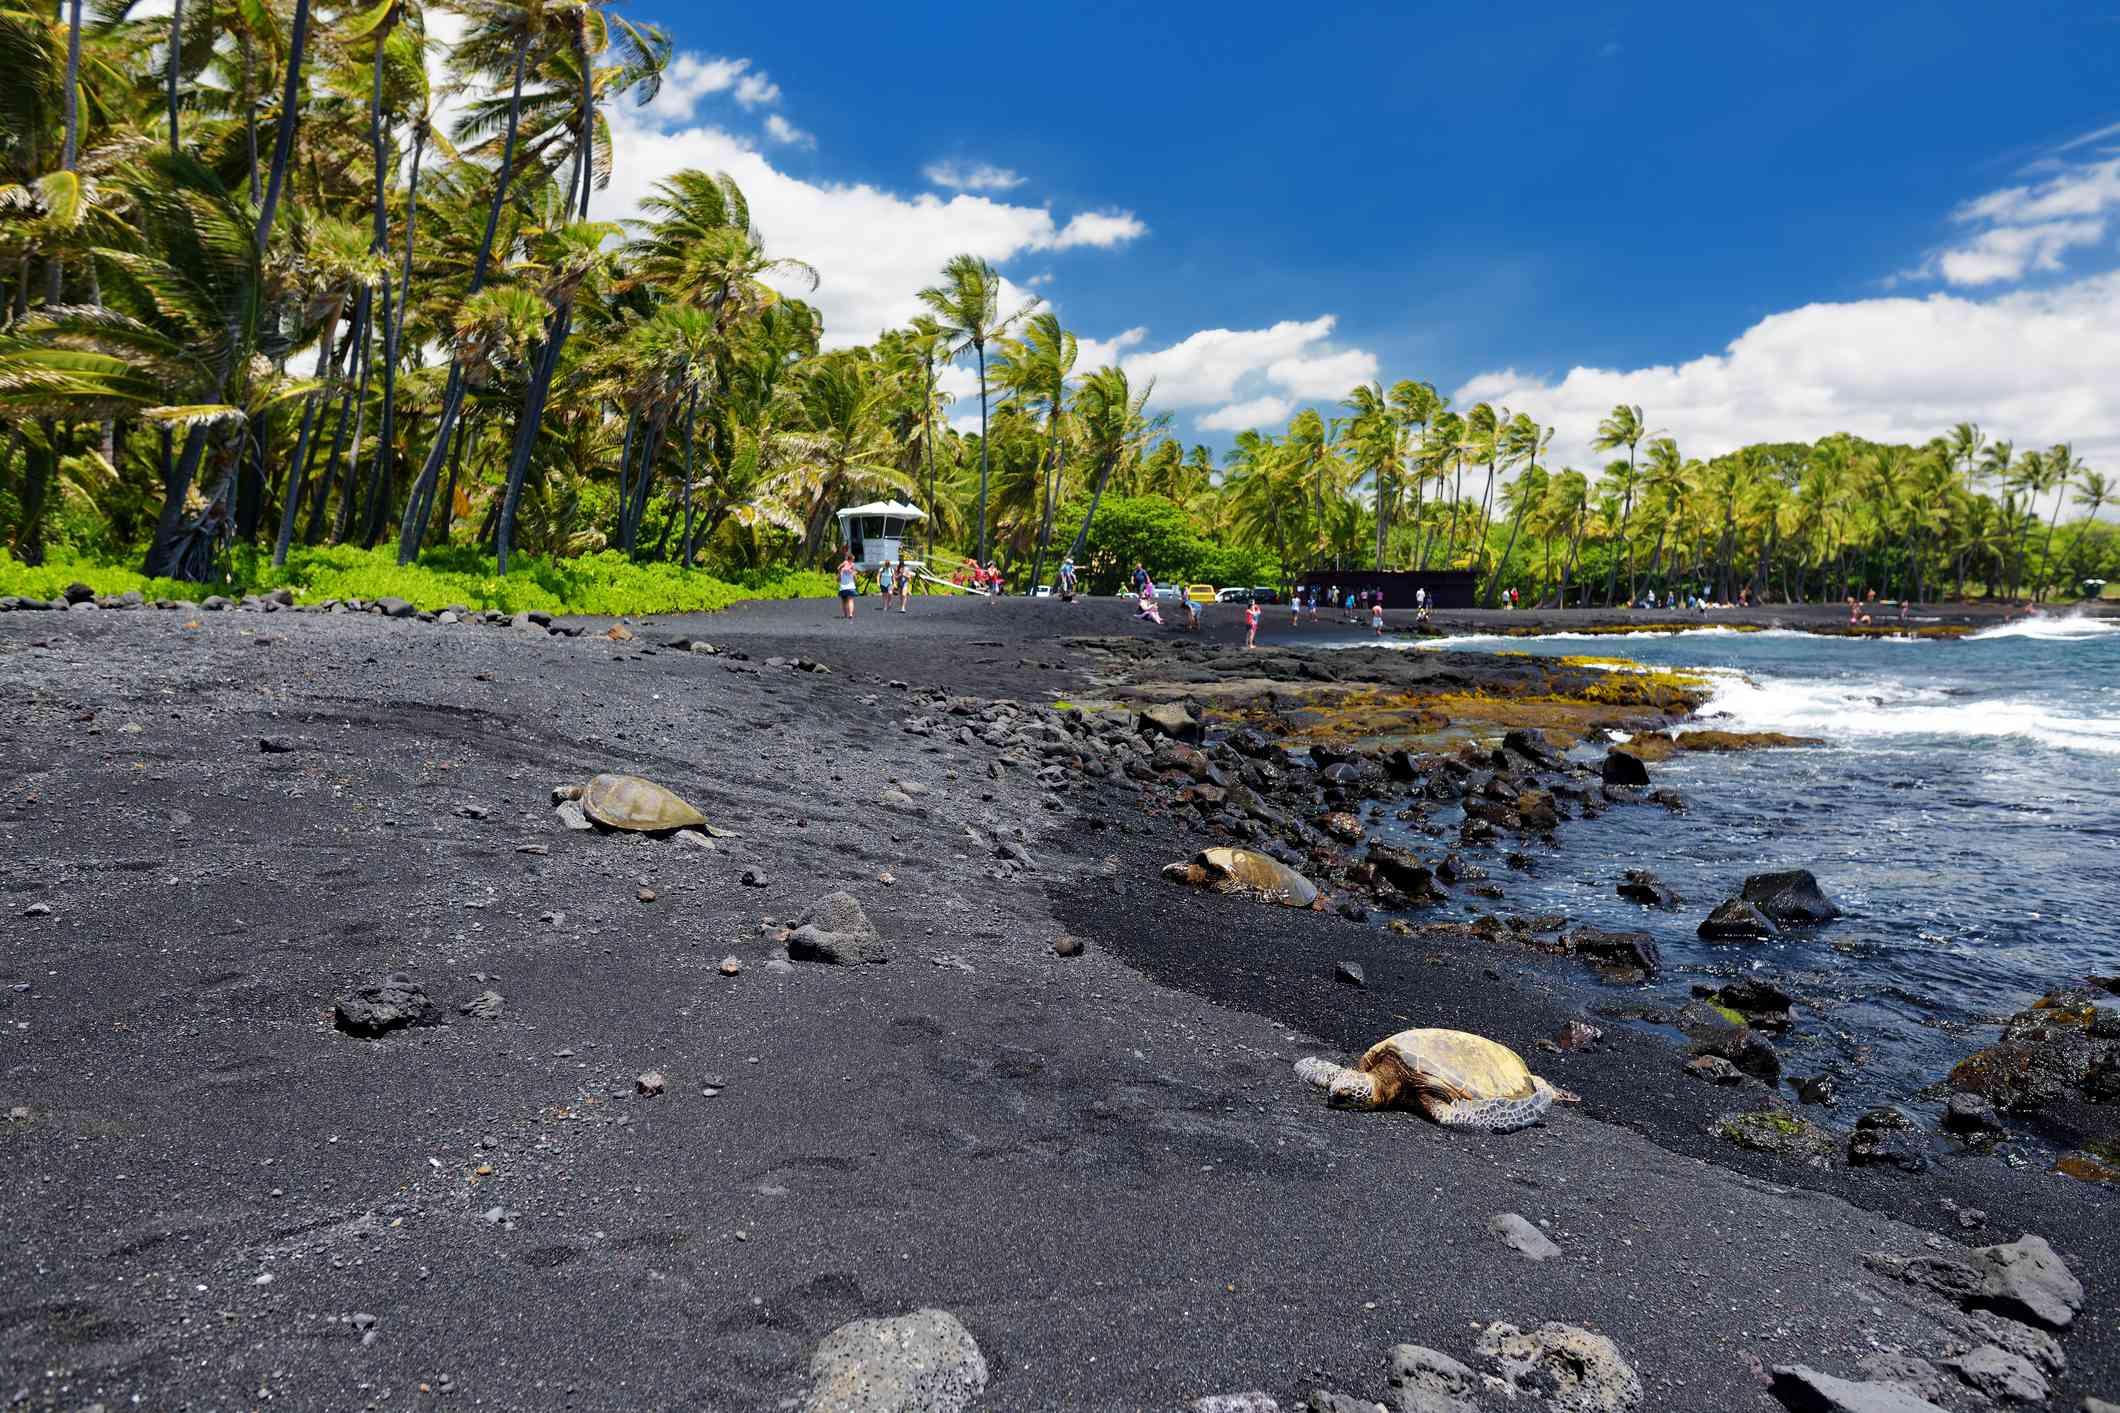 Playa de arena negra de Punalu'u, Hawái, EE. UU.